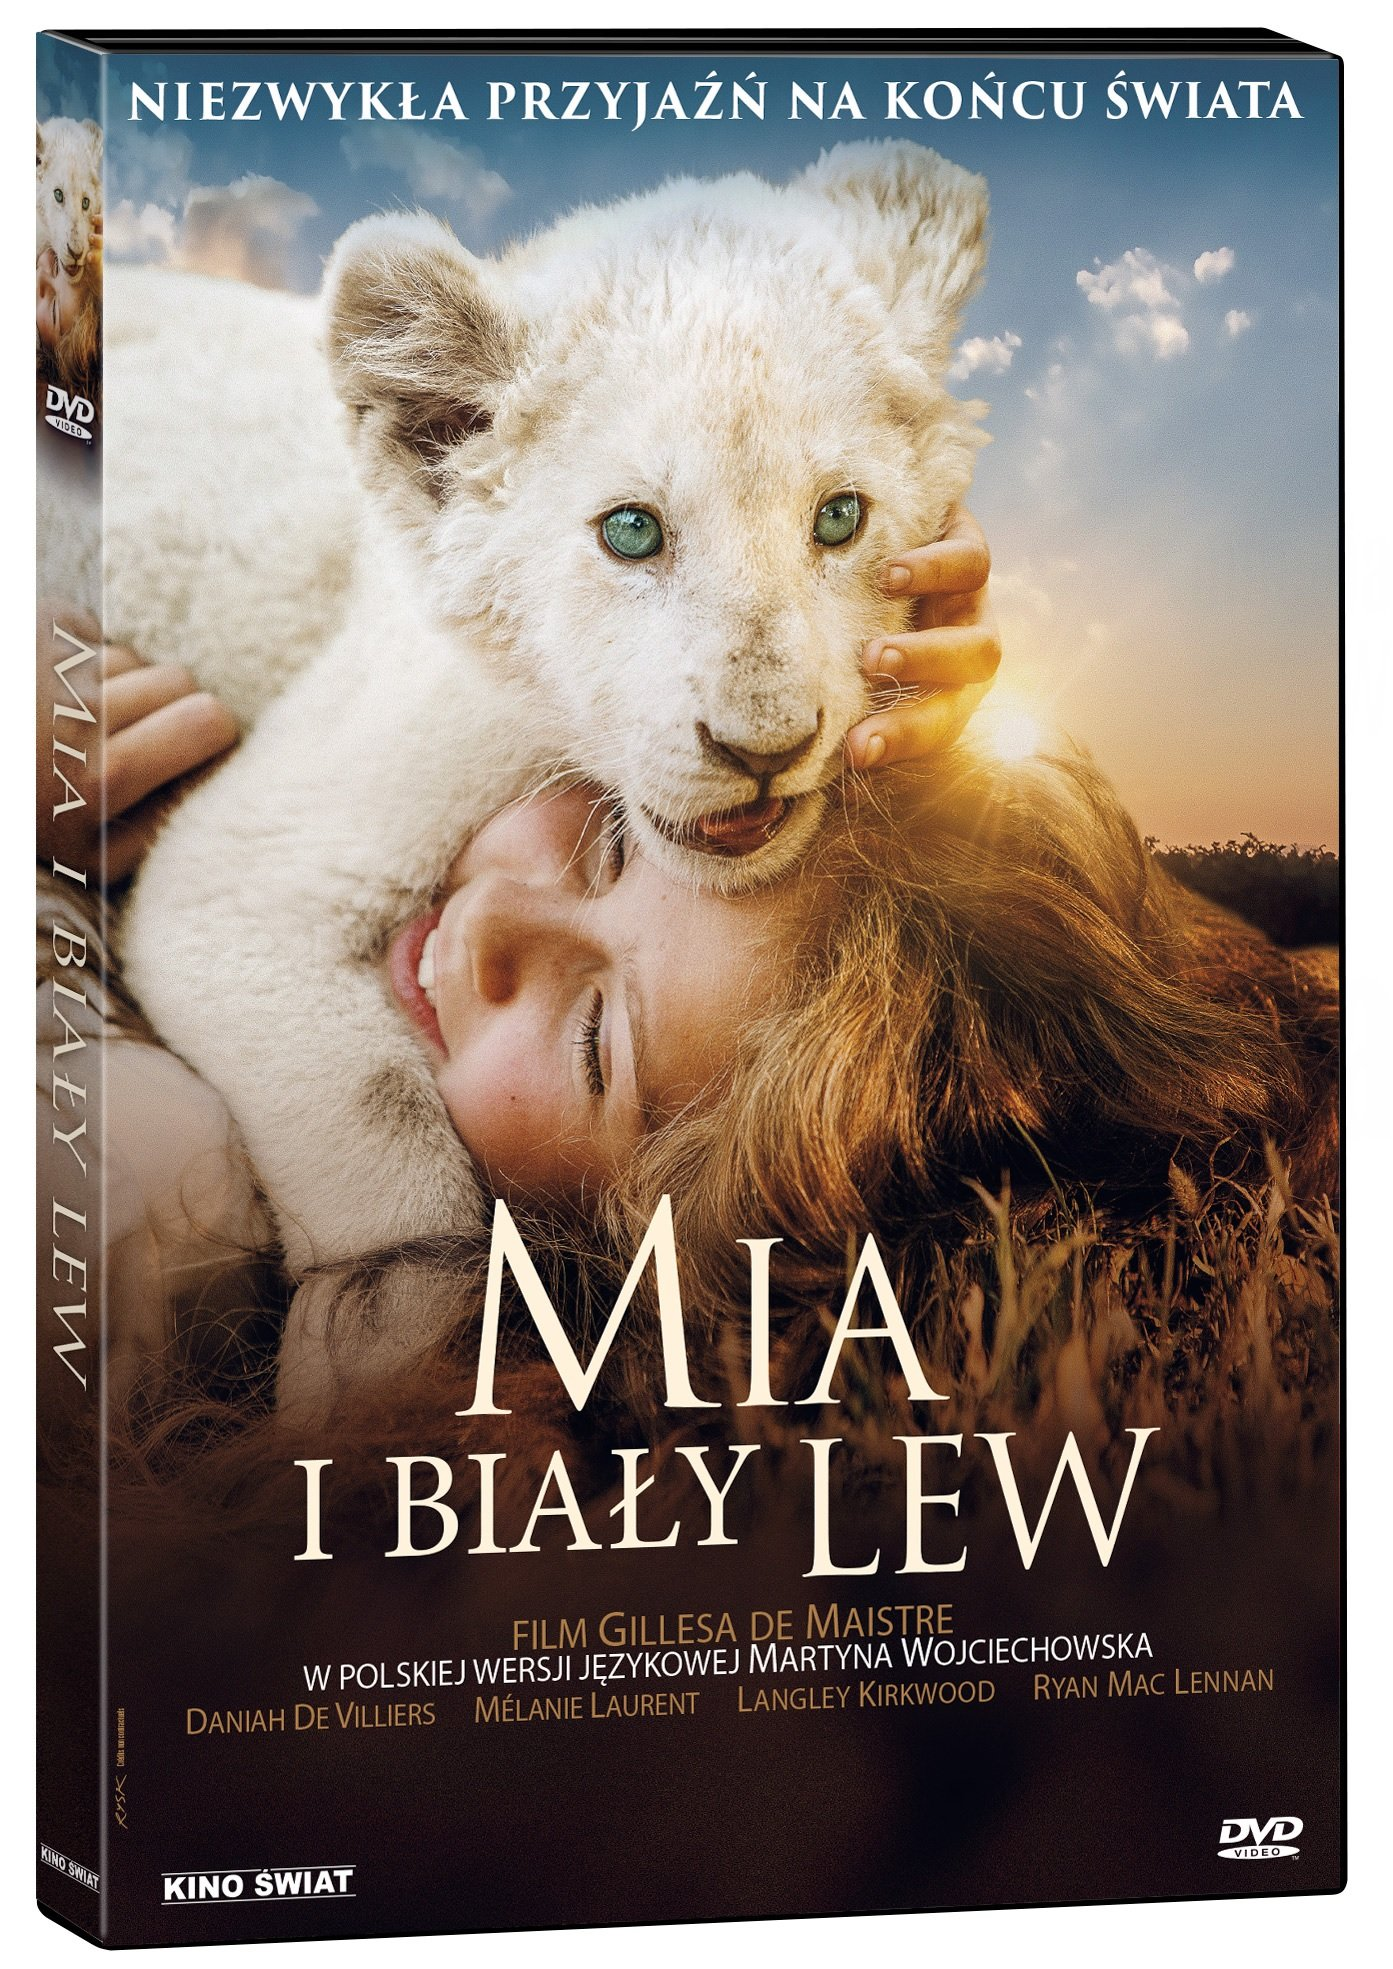 Mia_i_bialy_lew